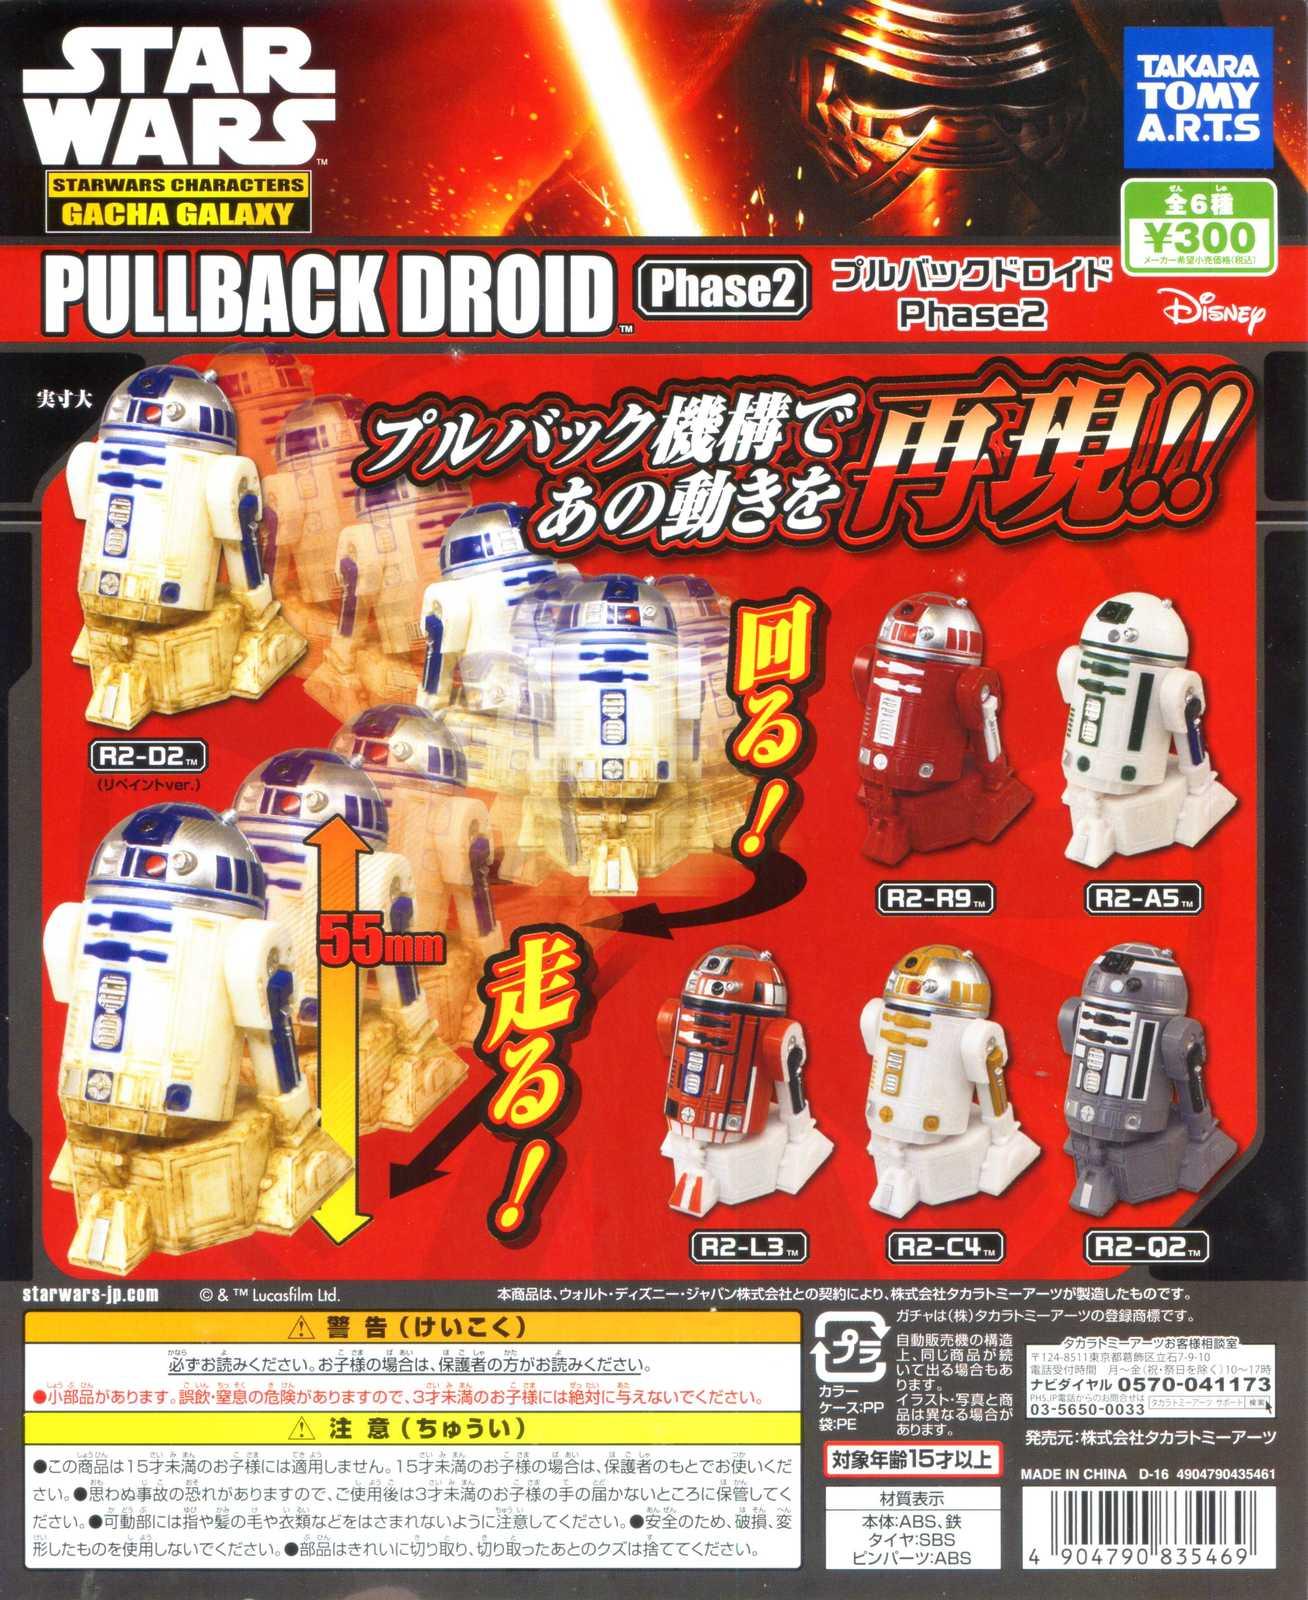 Art  star wars char gacha galaxy p2  pullback  1